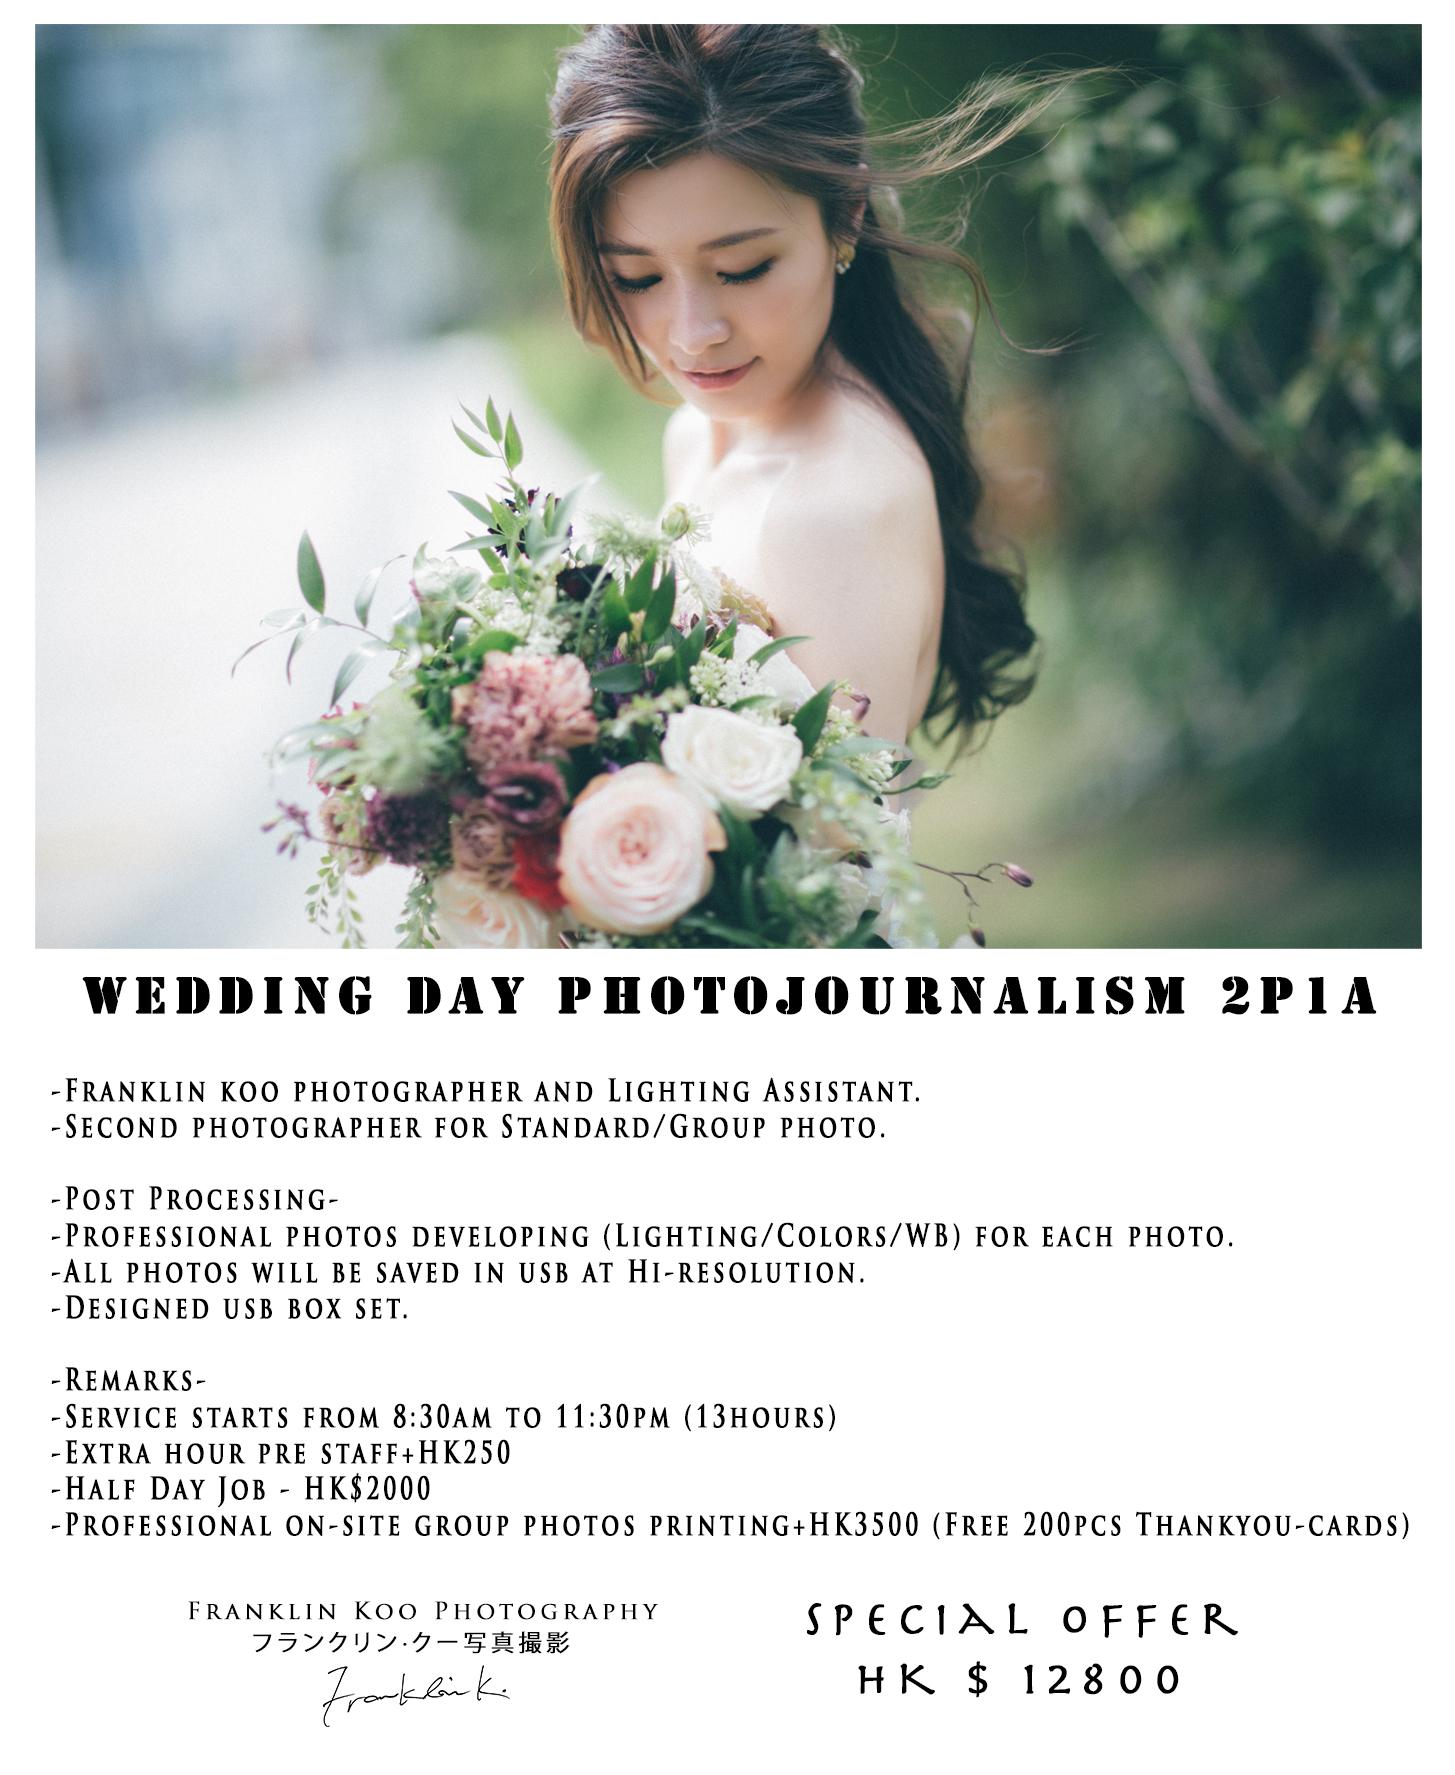 2020 Franklin Koo weddingday2p1a ratecard